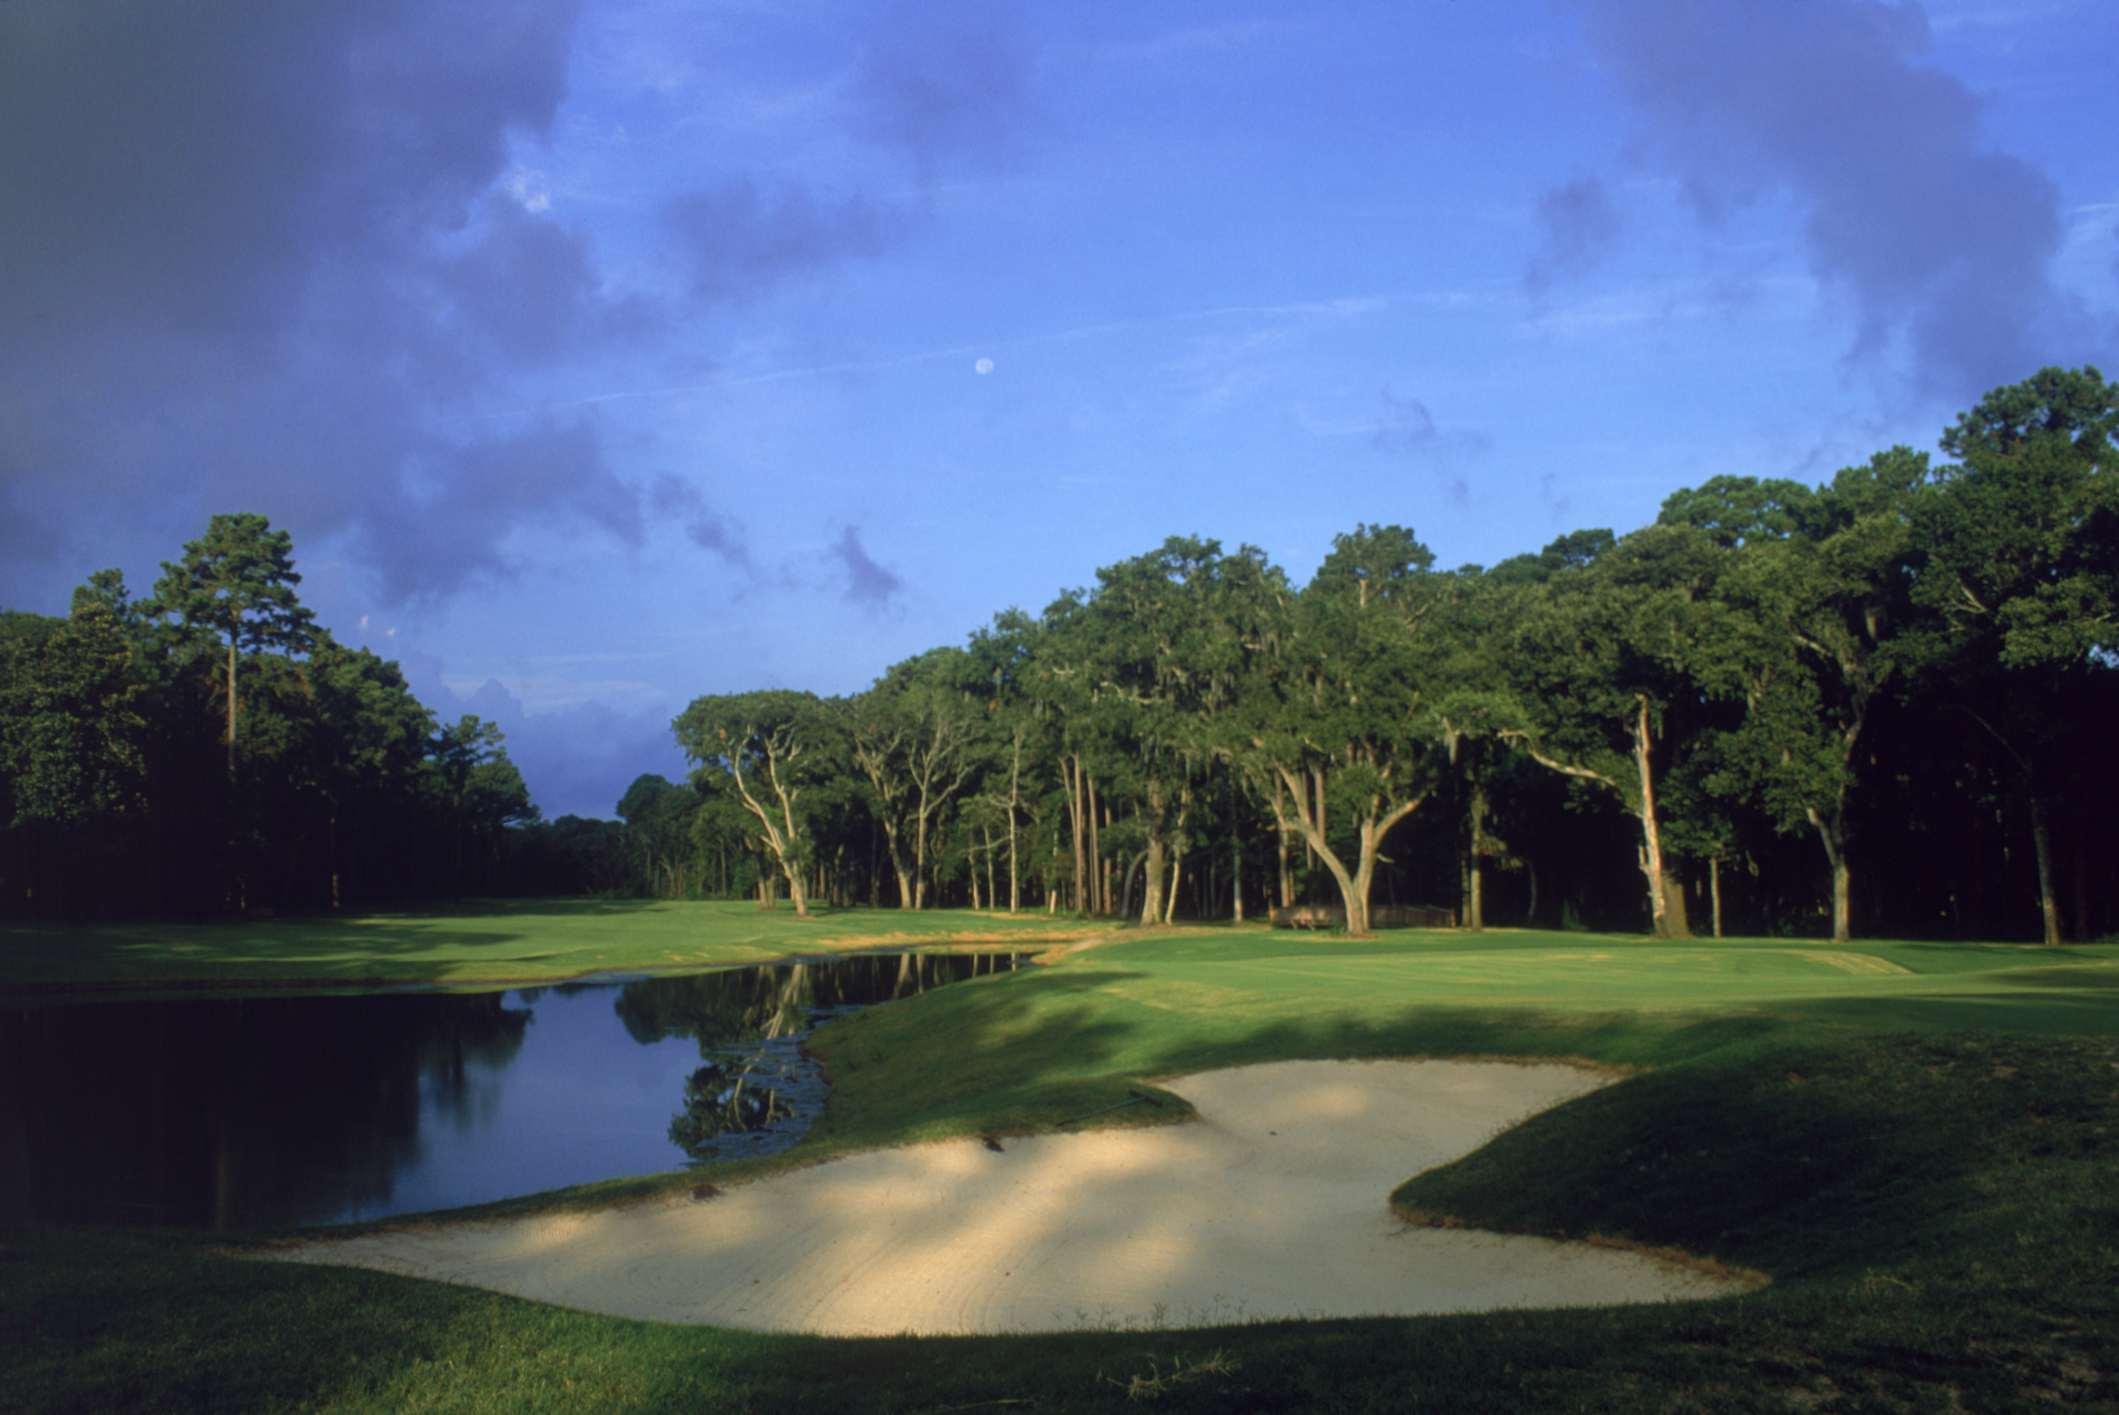 Golf course, Hilton Head Island, SC